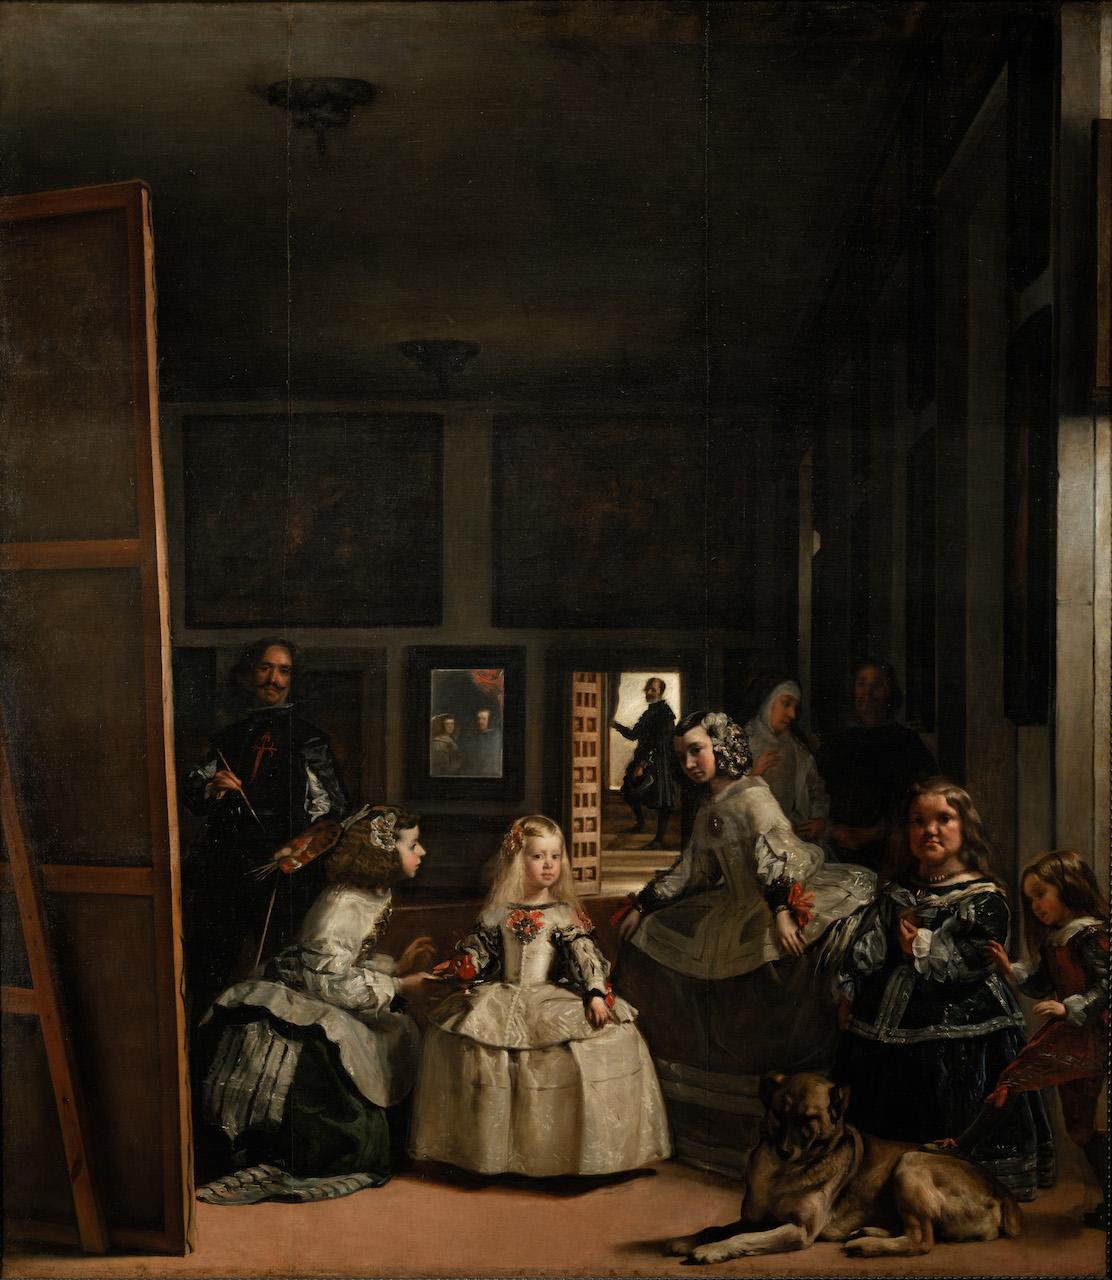 Diego Velázquez. Las Meninas. 1656 / 1657. Öl / Leinwand. 318 x 276cm